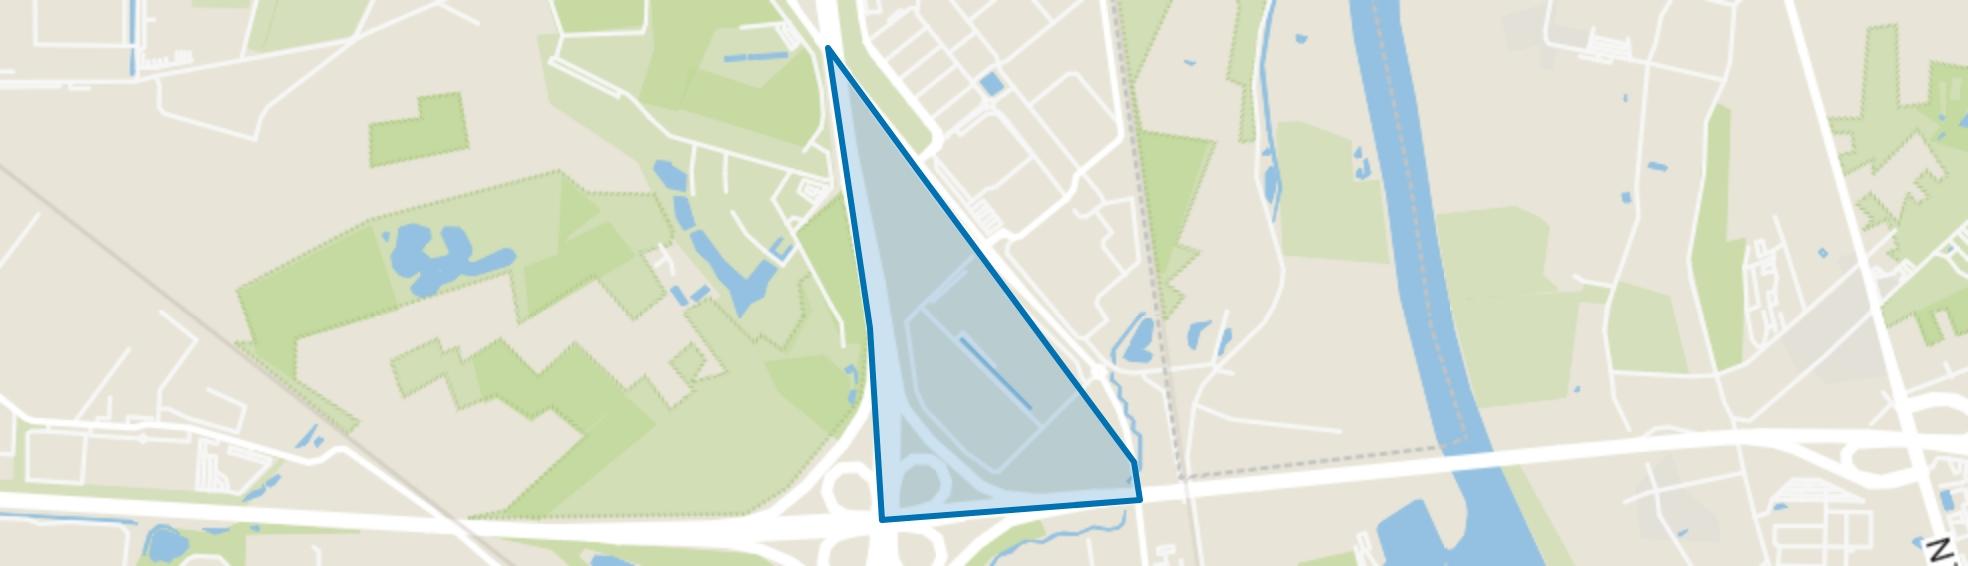 Trade-Port-Oost, Venlo map